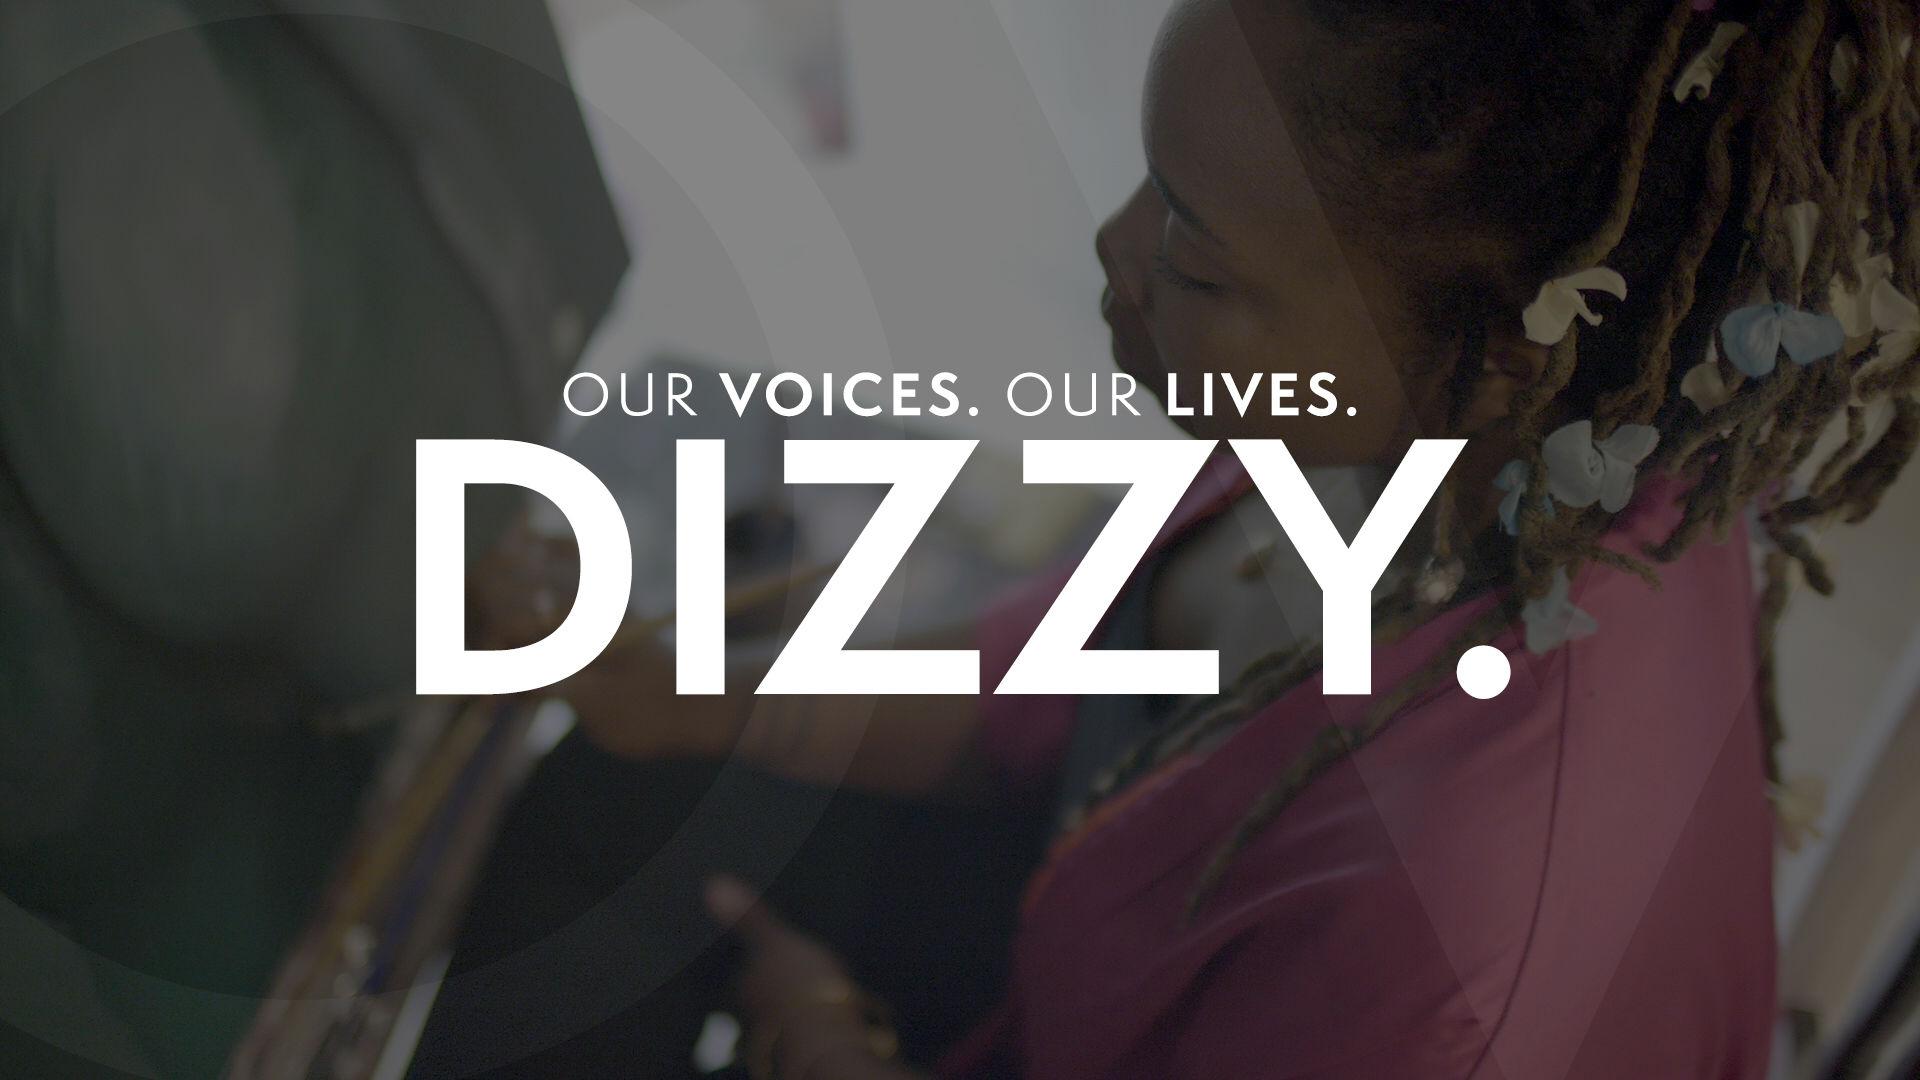 Our Voices. Our Lives. presents DIZZY.